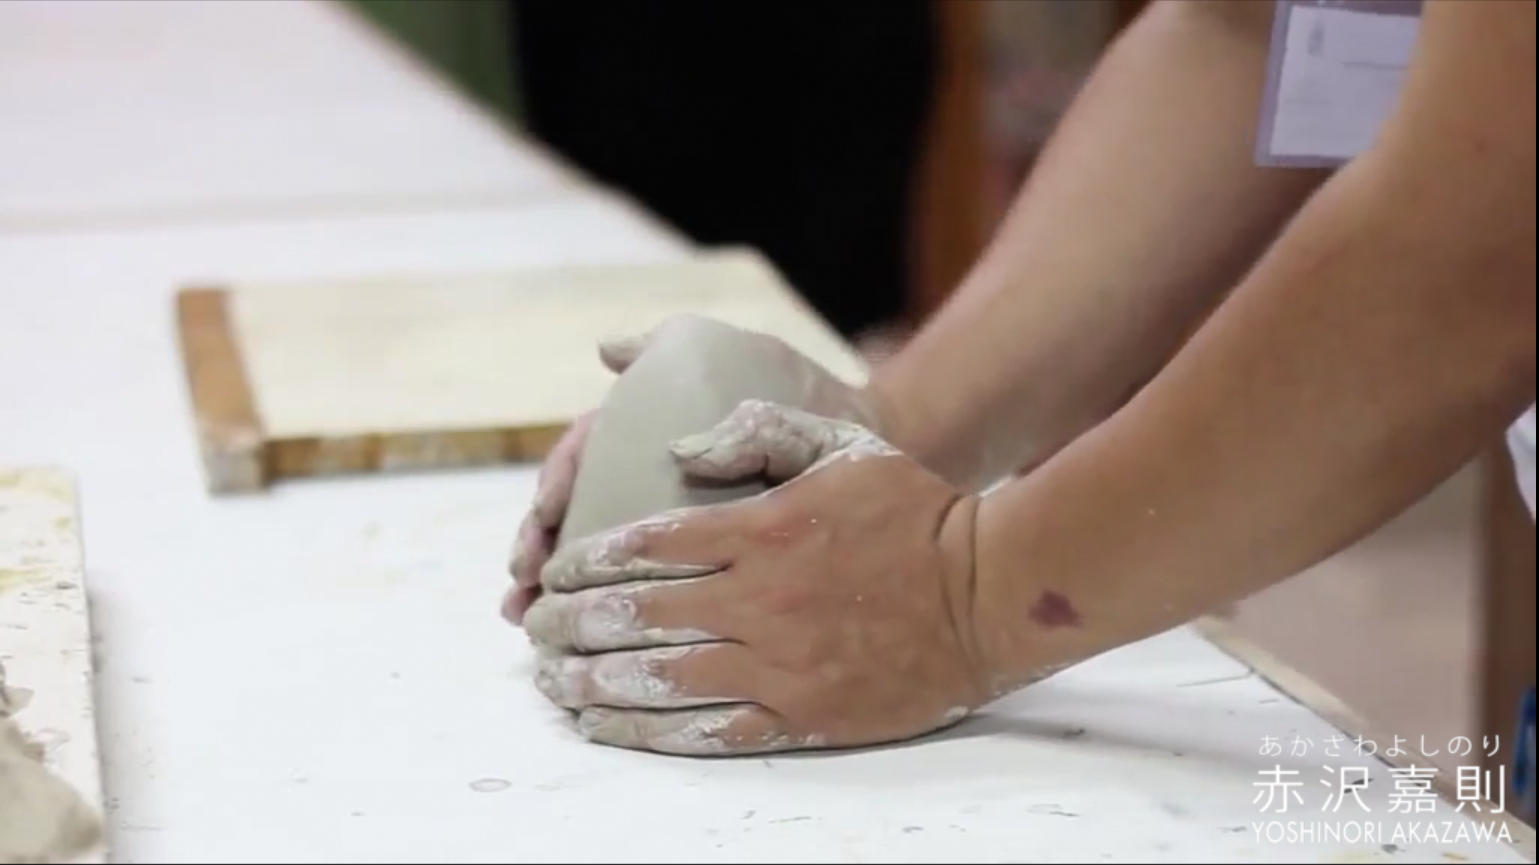 Yoshinori Akazawa in Tunisia 2013 international ceramic symposium